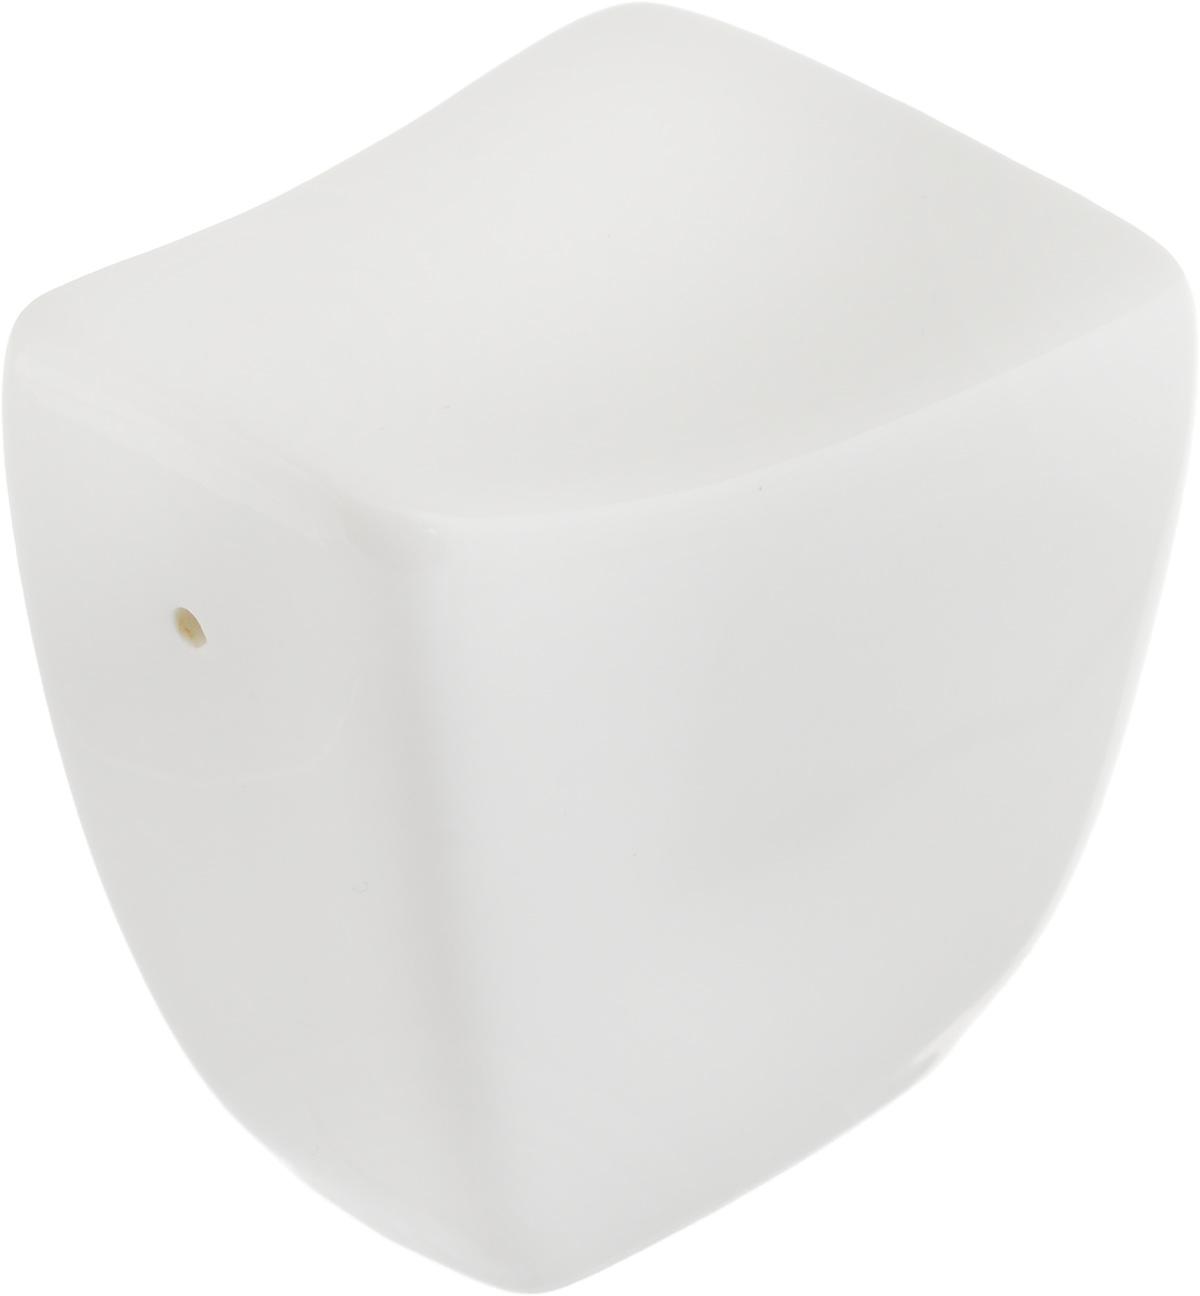 Перечница Ariane Rectangle, 6,5 х 5,5 х 4 см солонка ariane rectangle 5 х 5 5 х 4 см